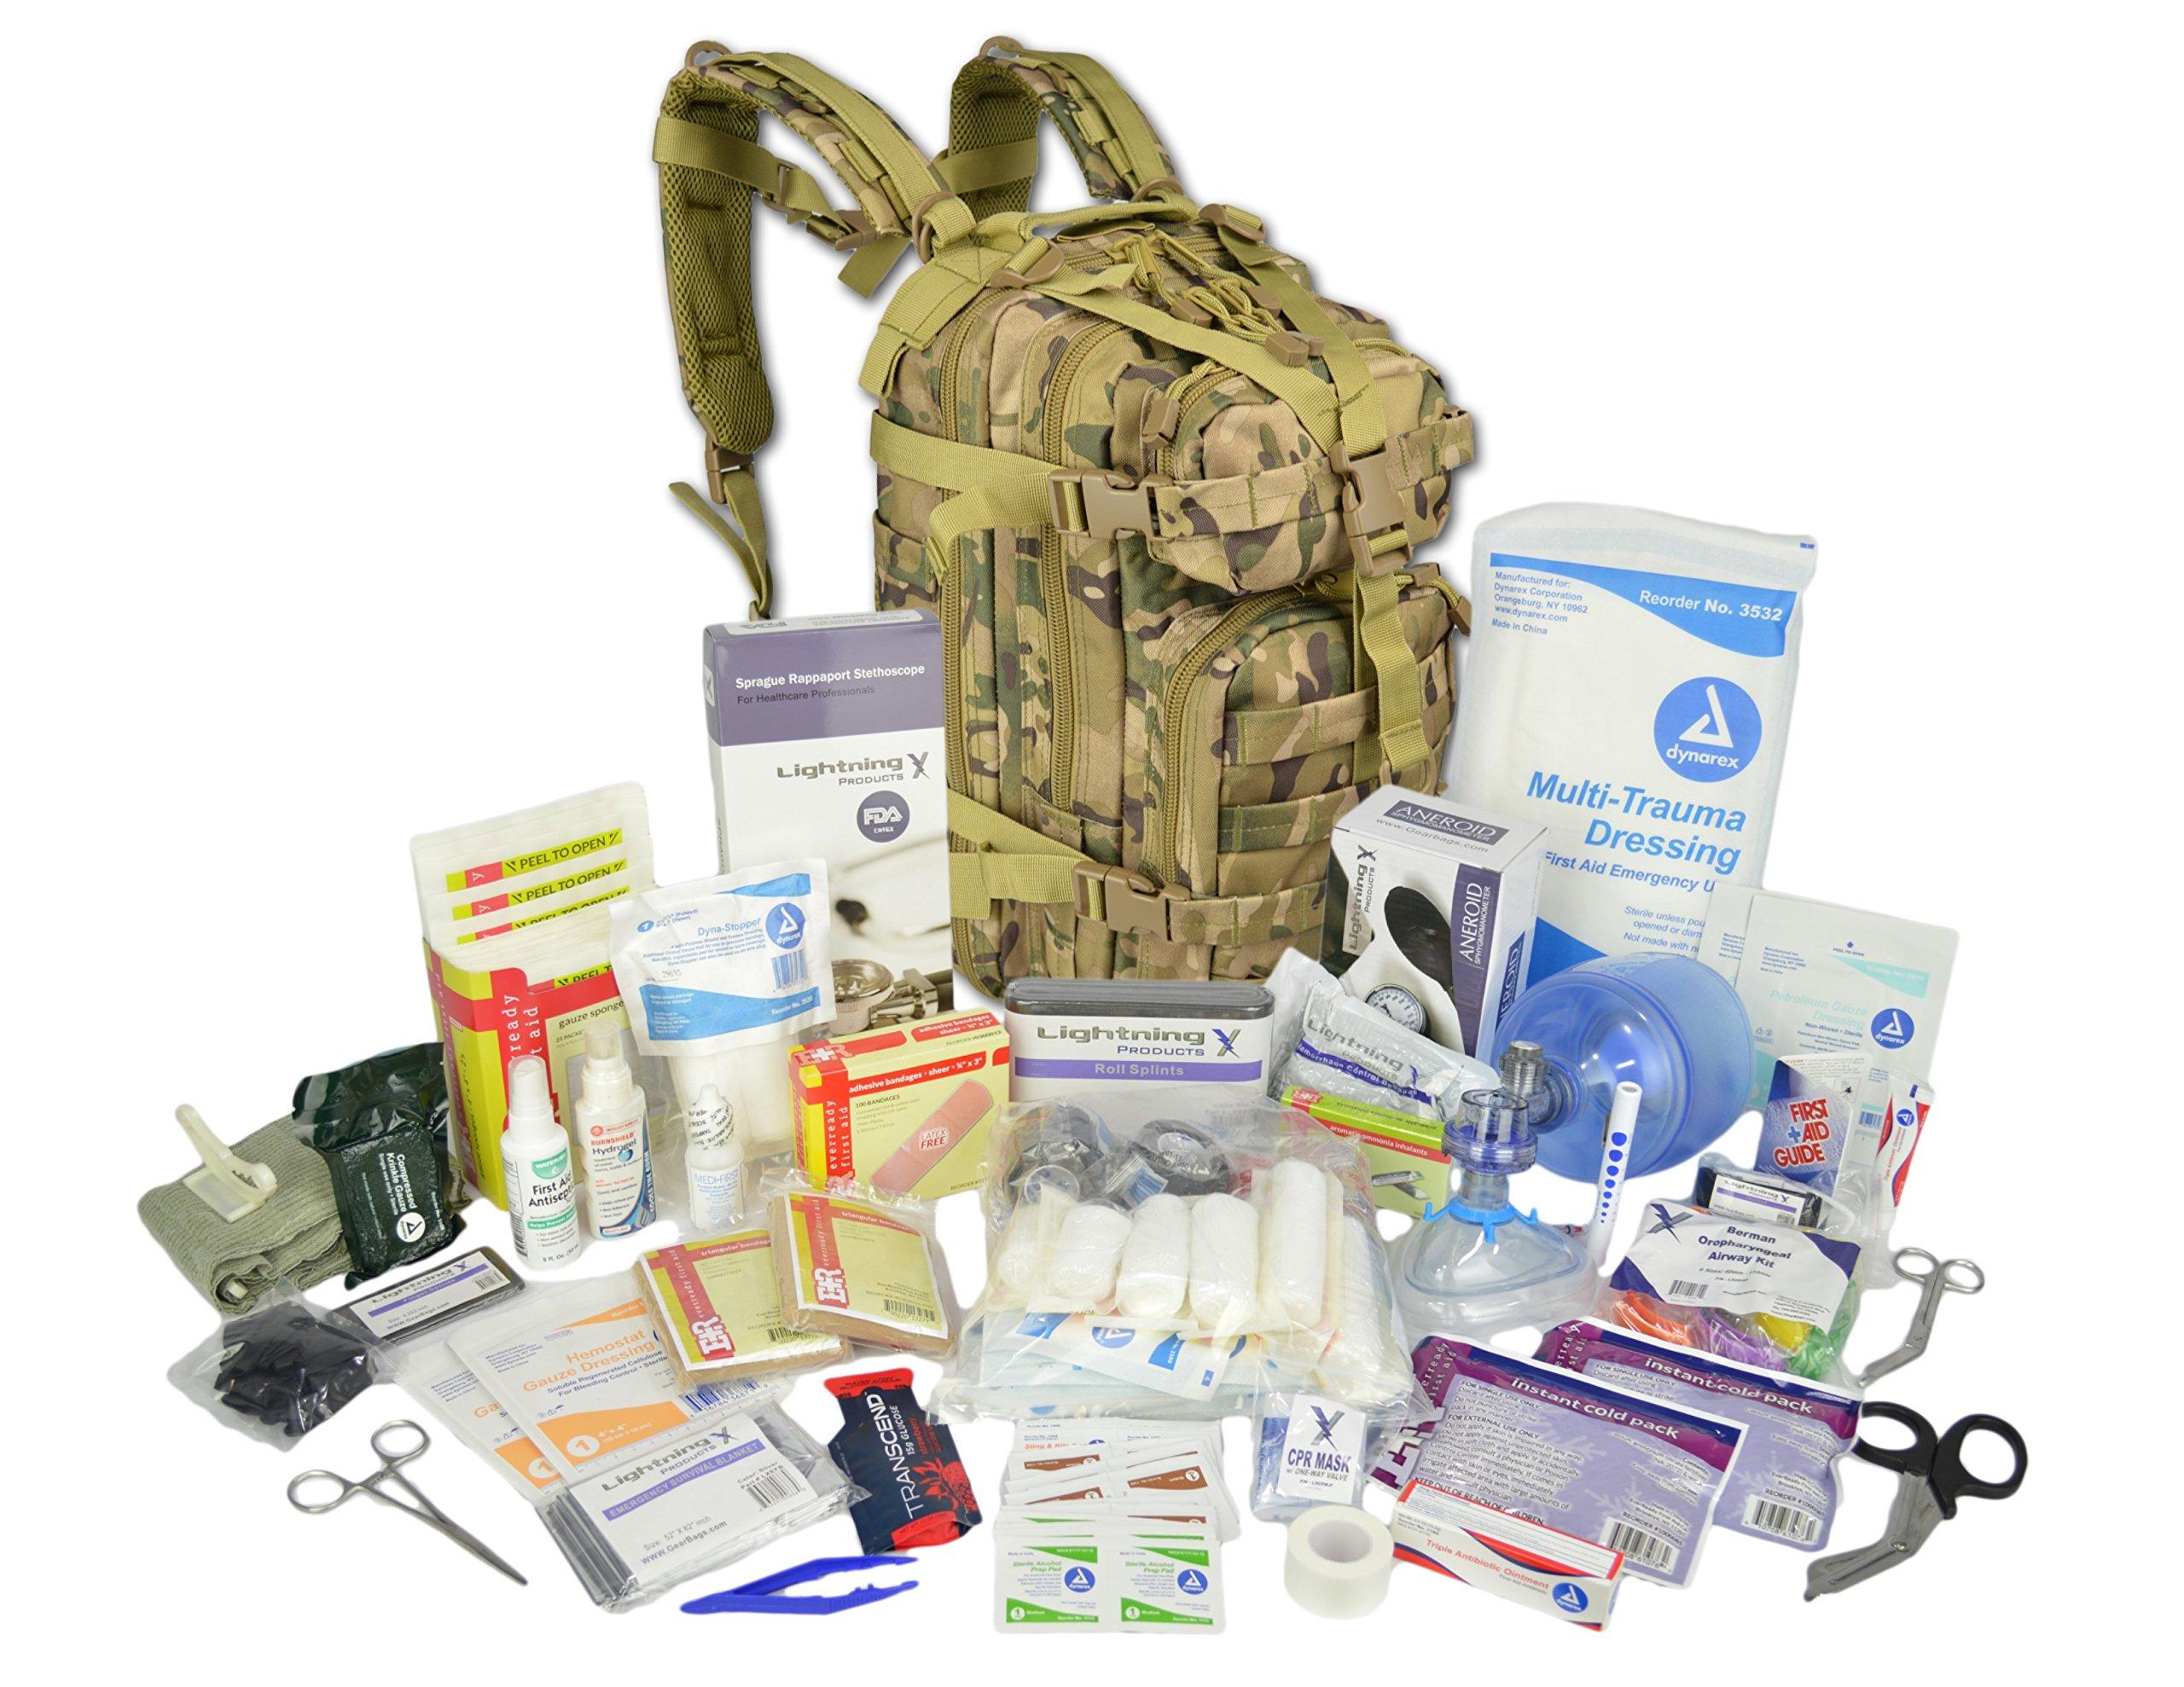 Lightning X Stocked EMS/EMT Trauma & Bleeding First Aid Responder Medical Backpack + Kit - Multicam